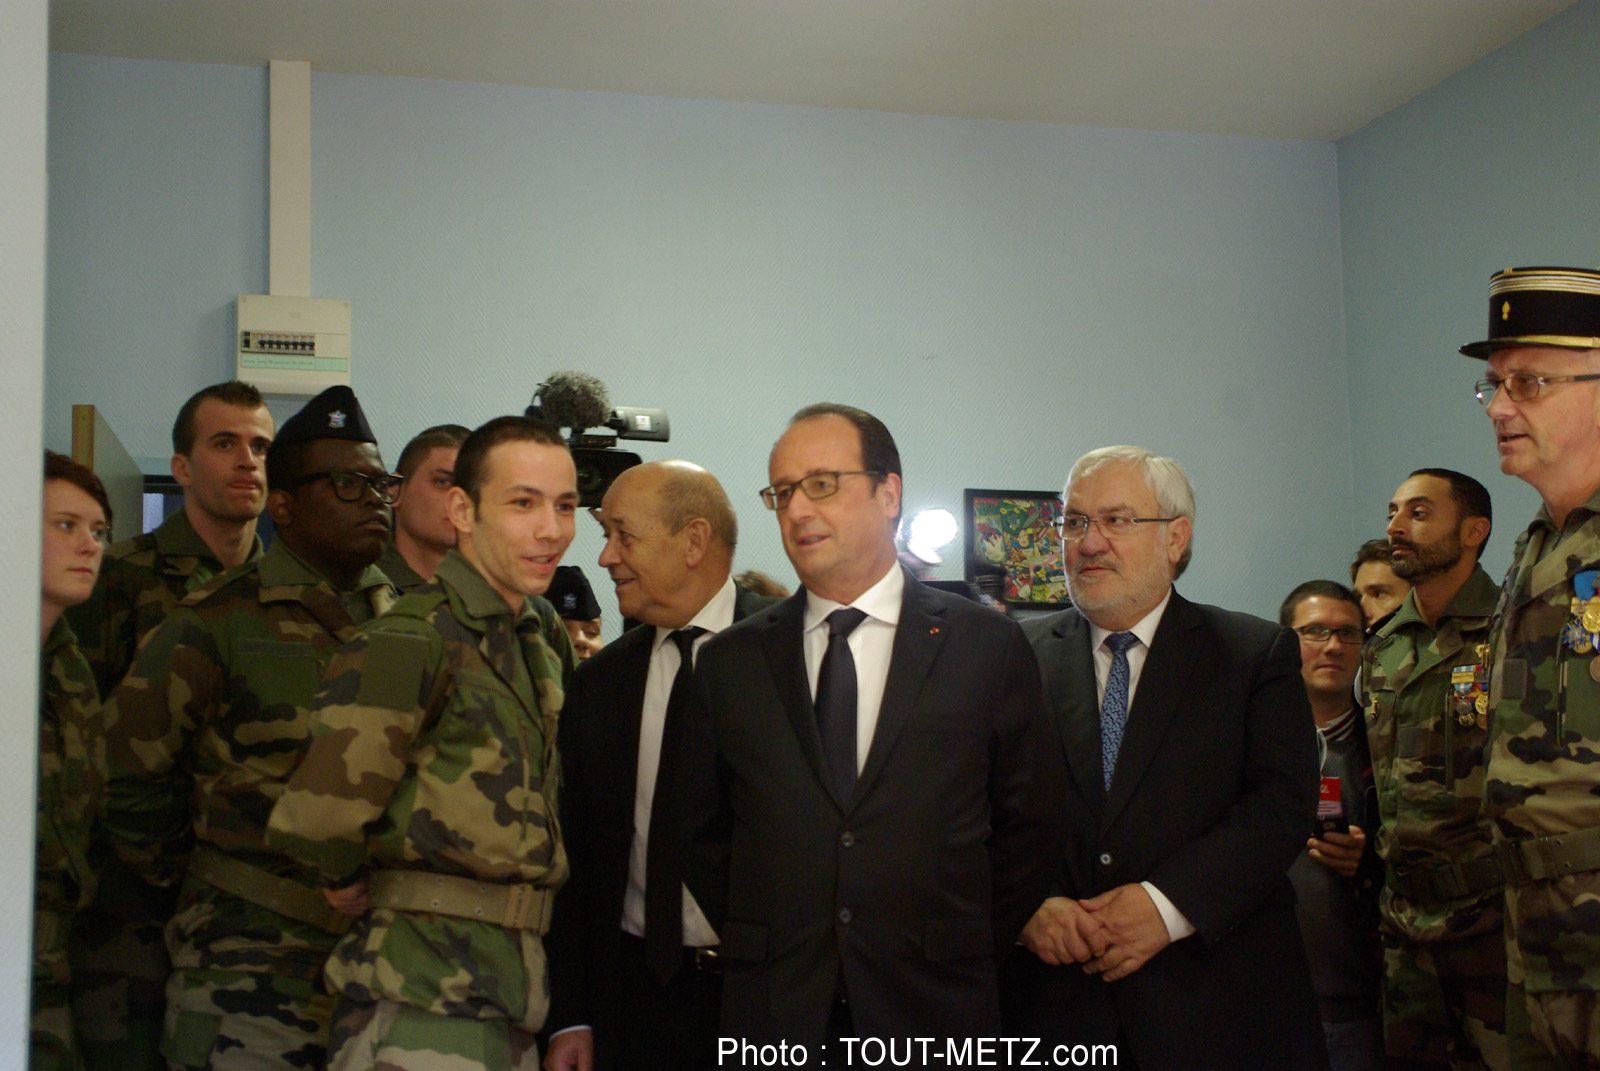 Photo of Montigny-les-Metz : François Hollande inaugure le Service Militaire Volontaire (photos)